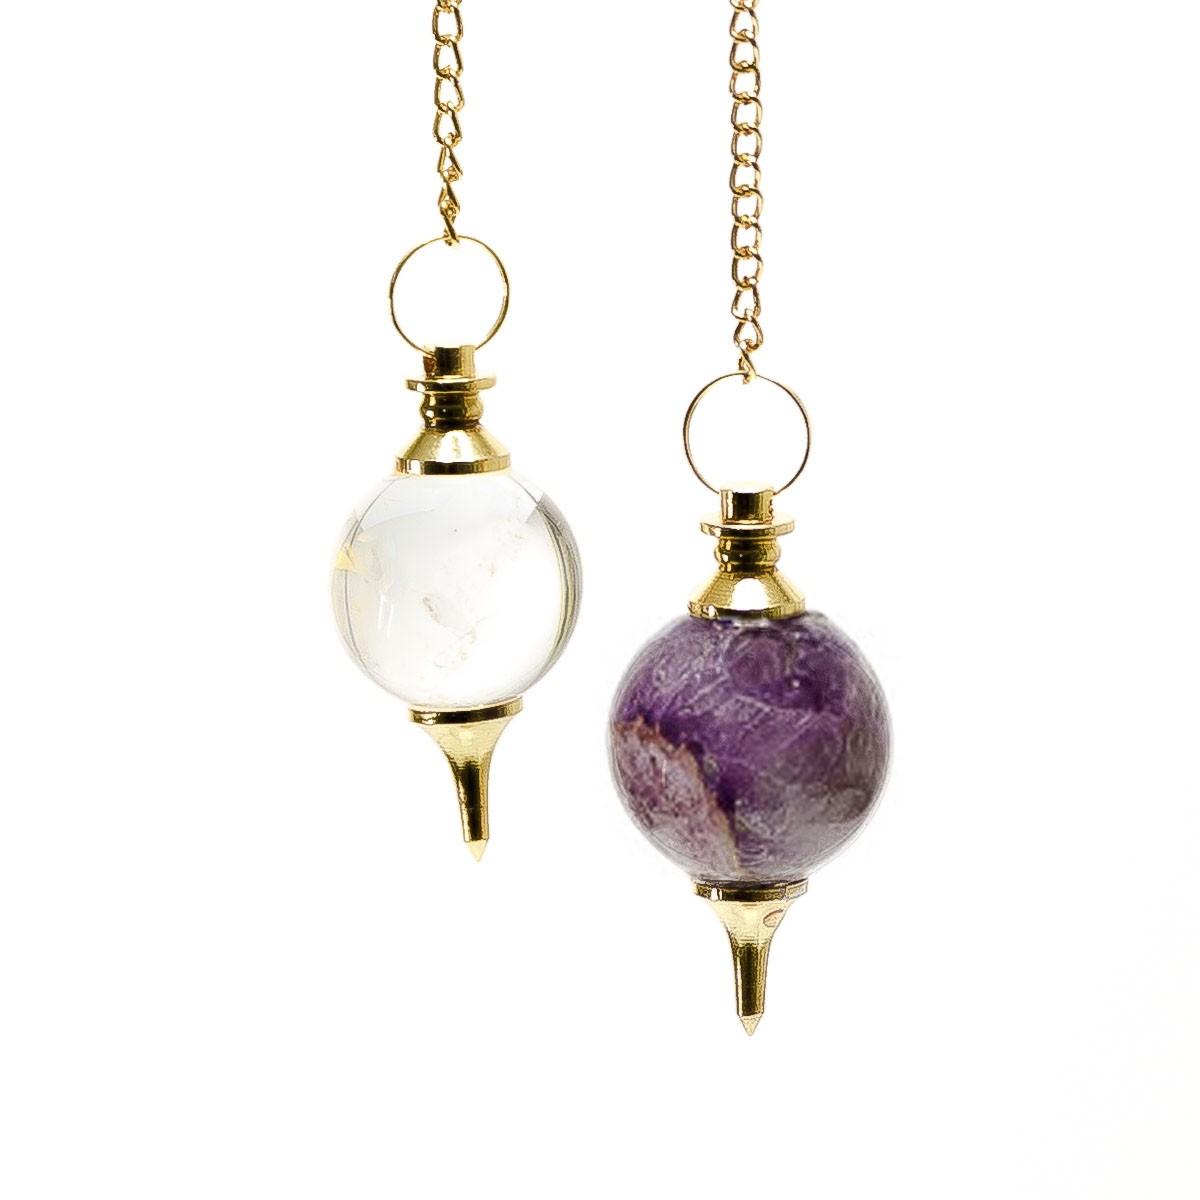 Bergkristall Kugelpendel – gold